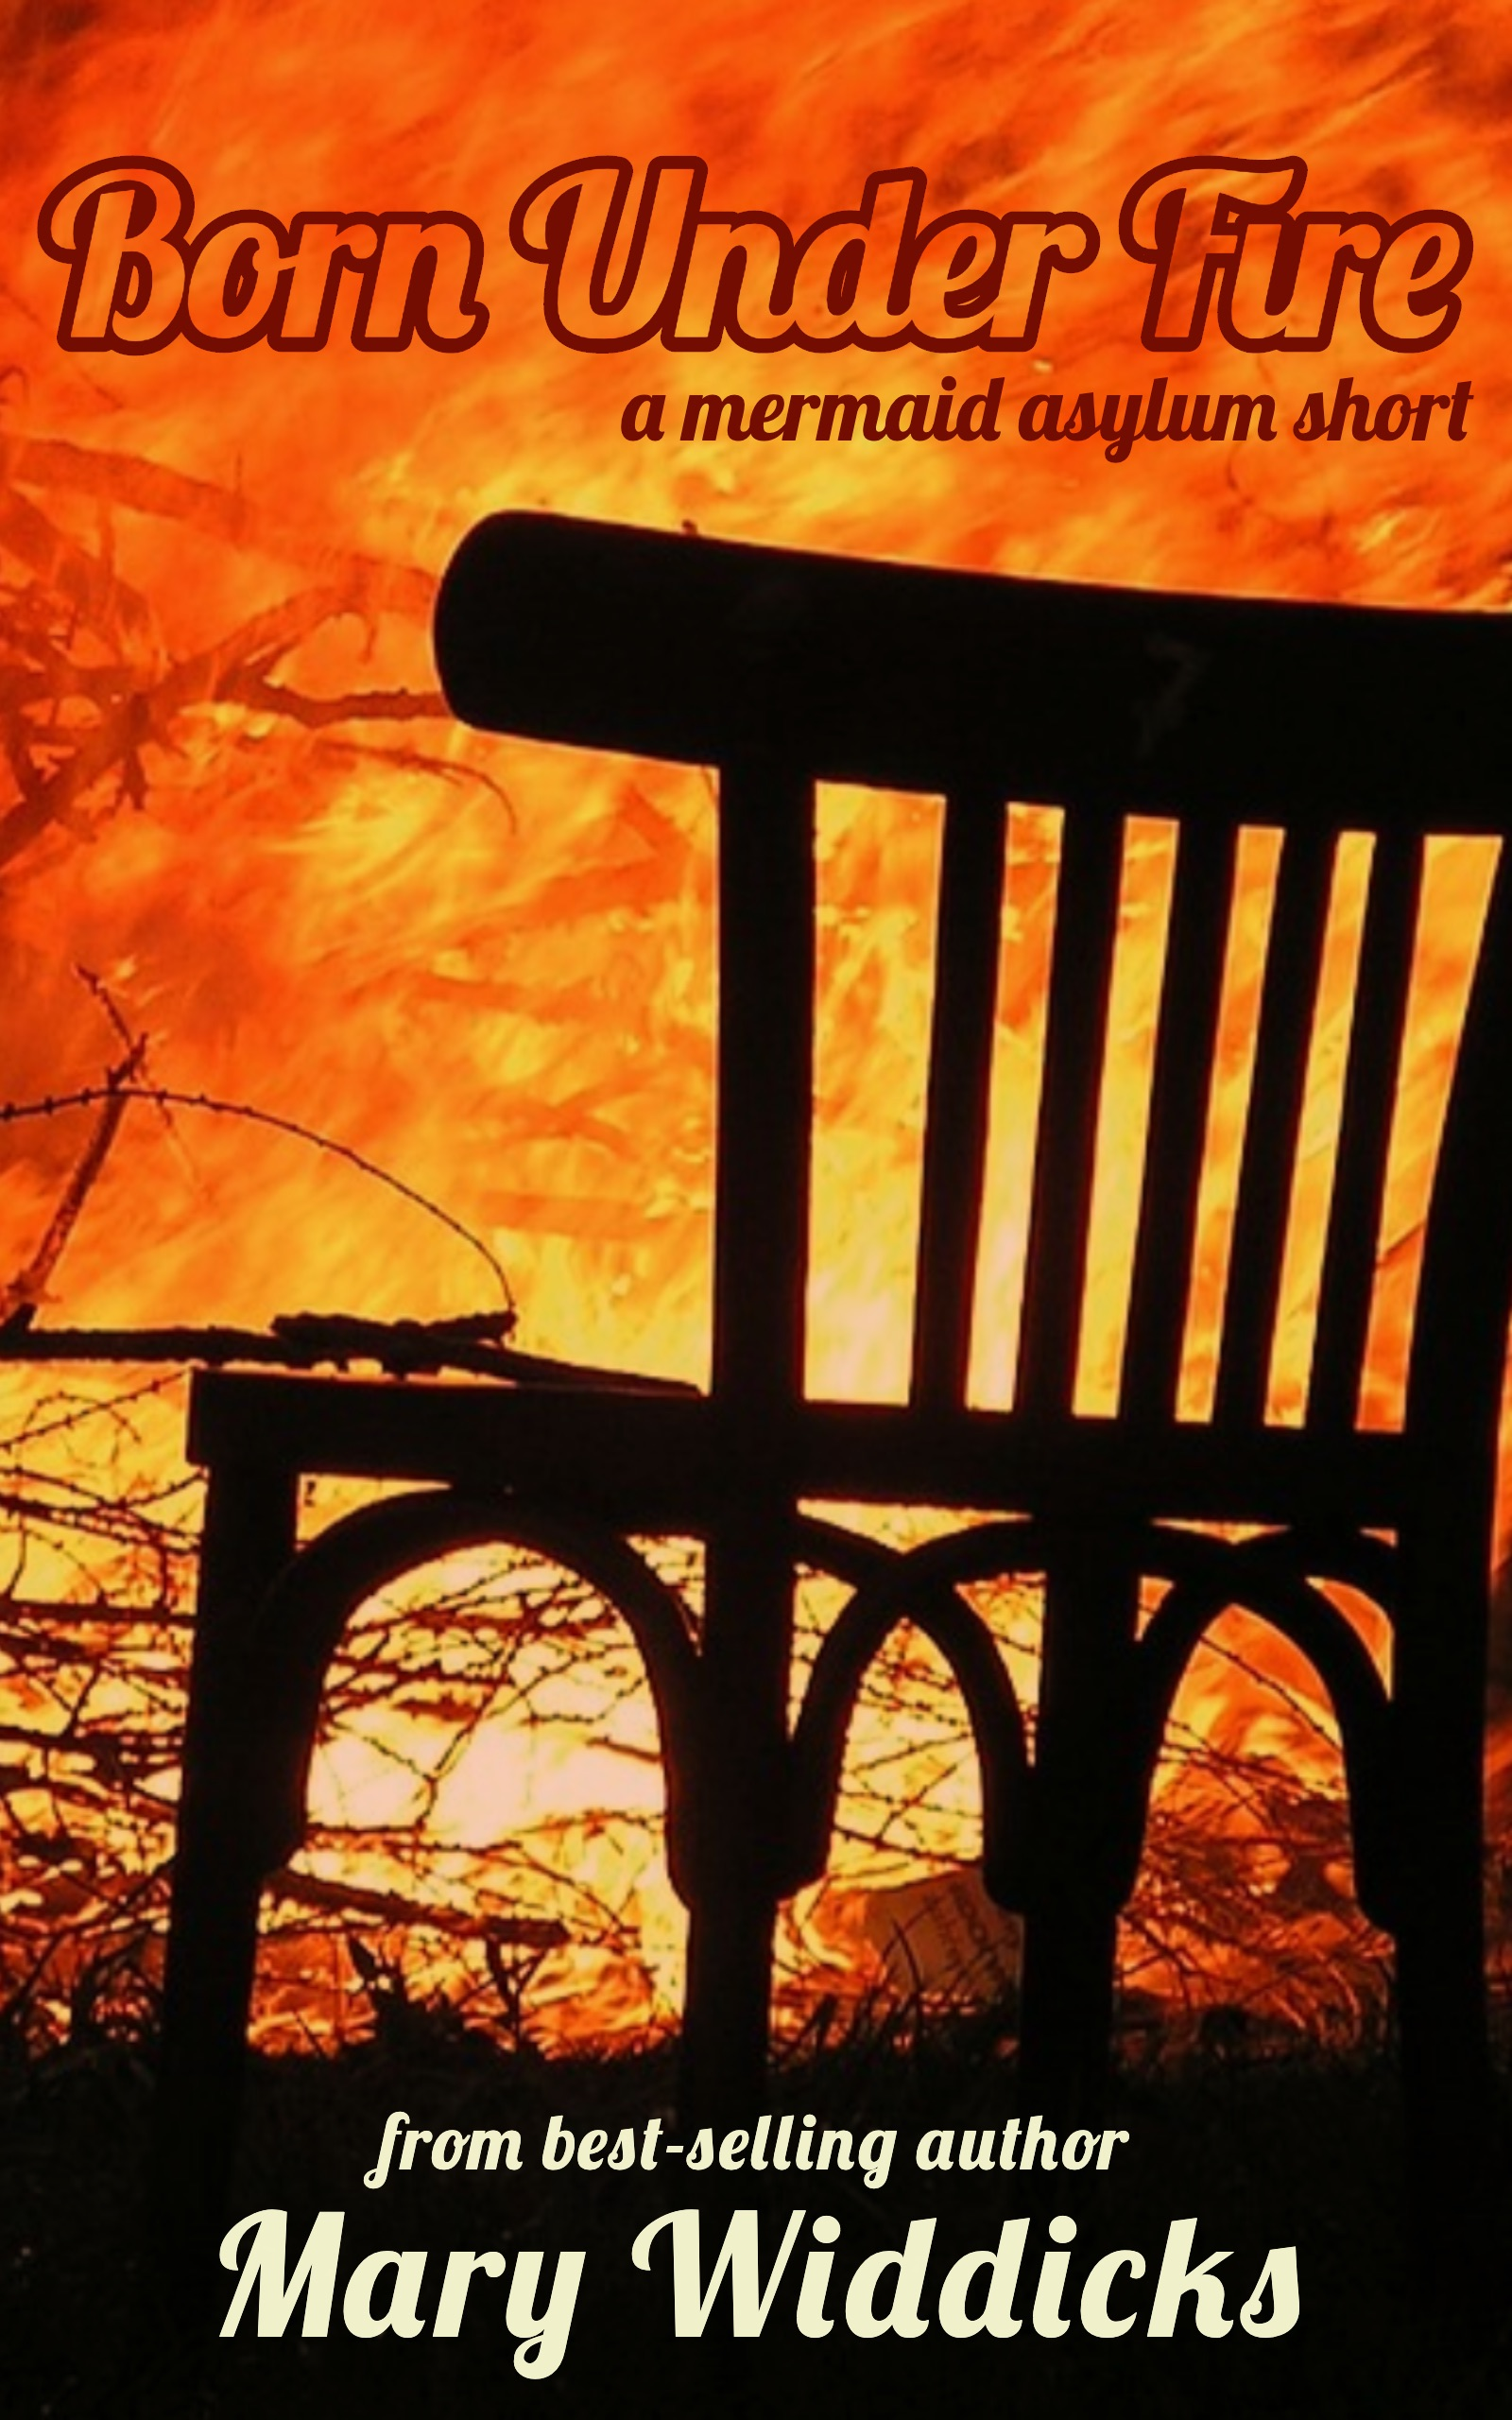 Fire cover.jpg